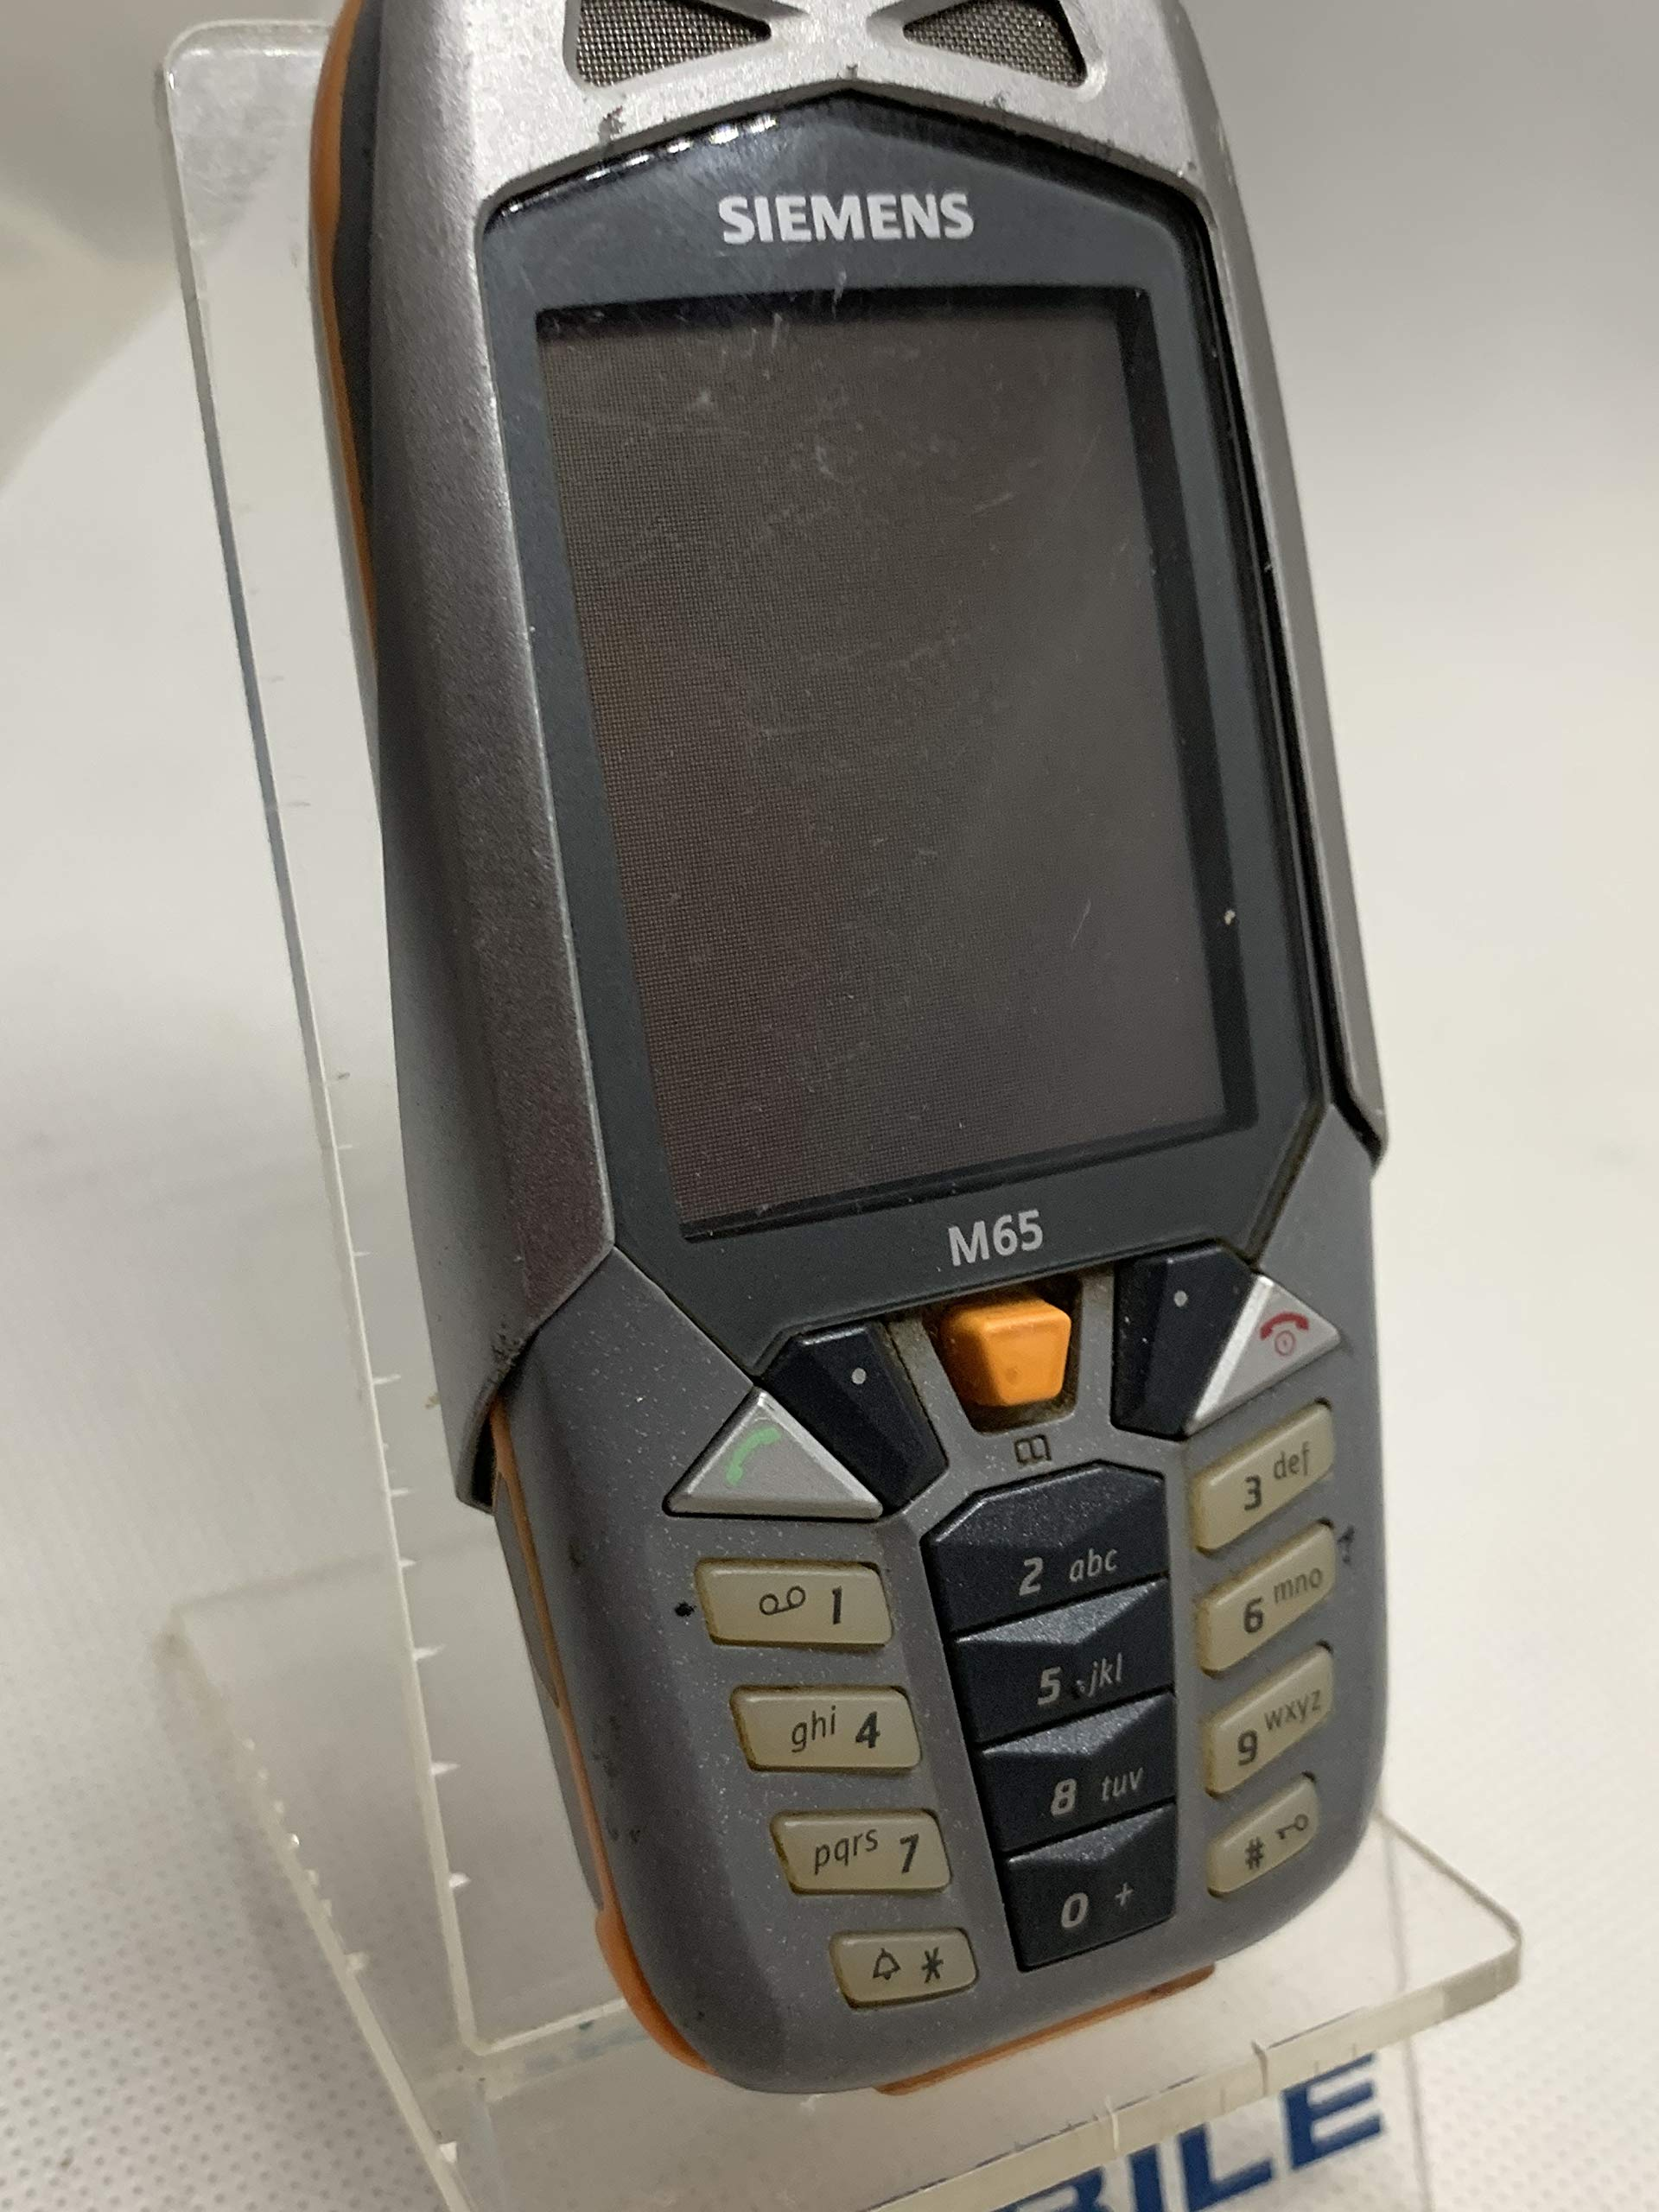 NG de Mobile BenQ Siemens M65 Teléfono Móvil, Gris: Amazon.es: Electrónica